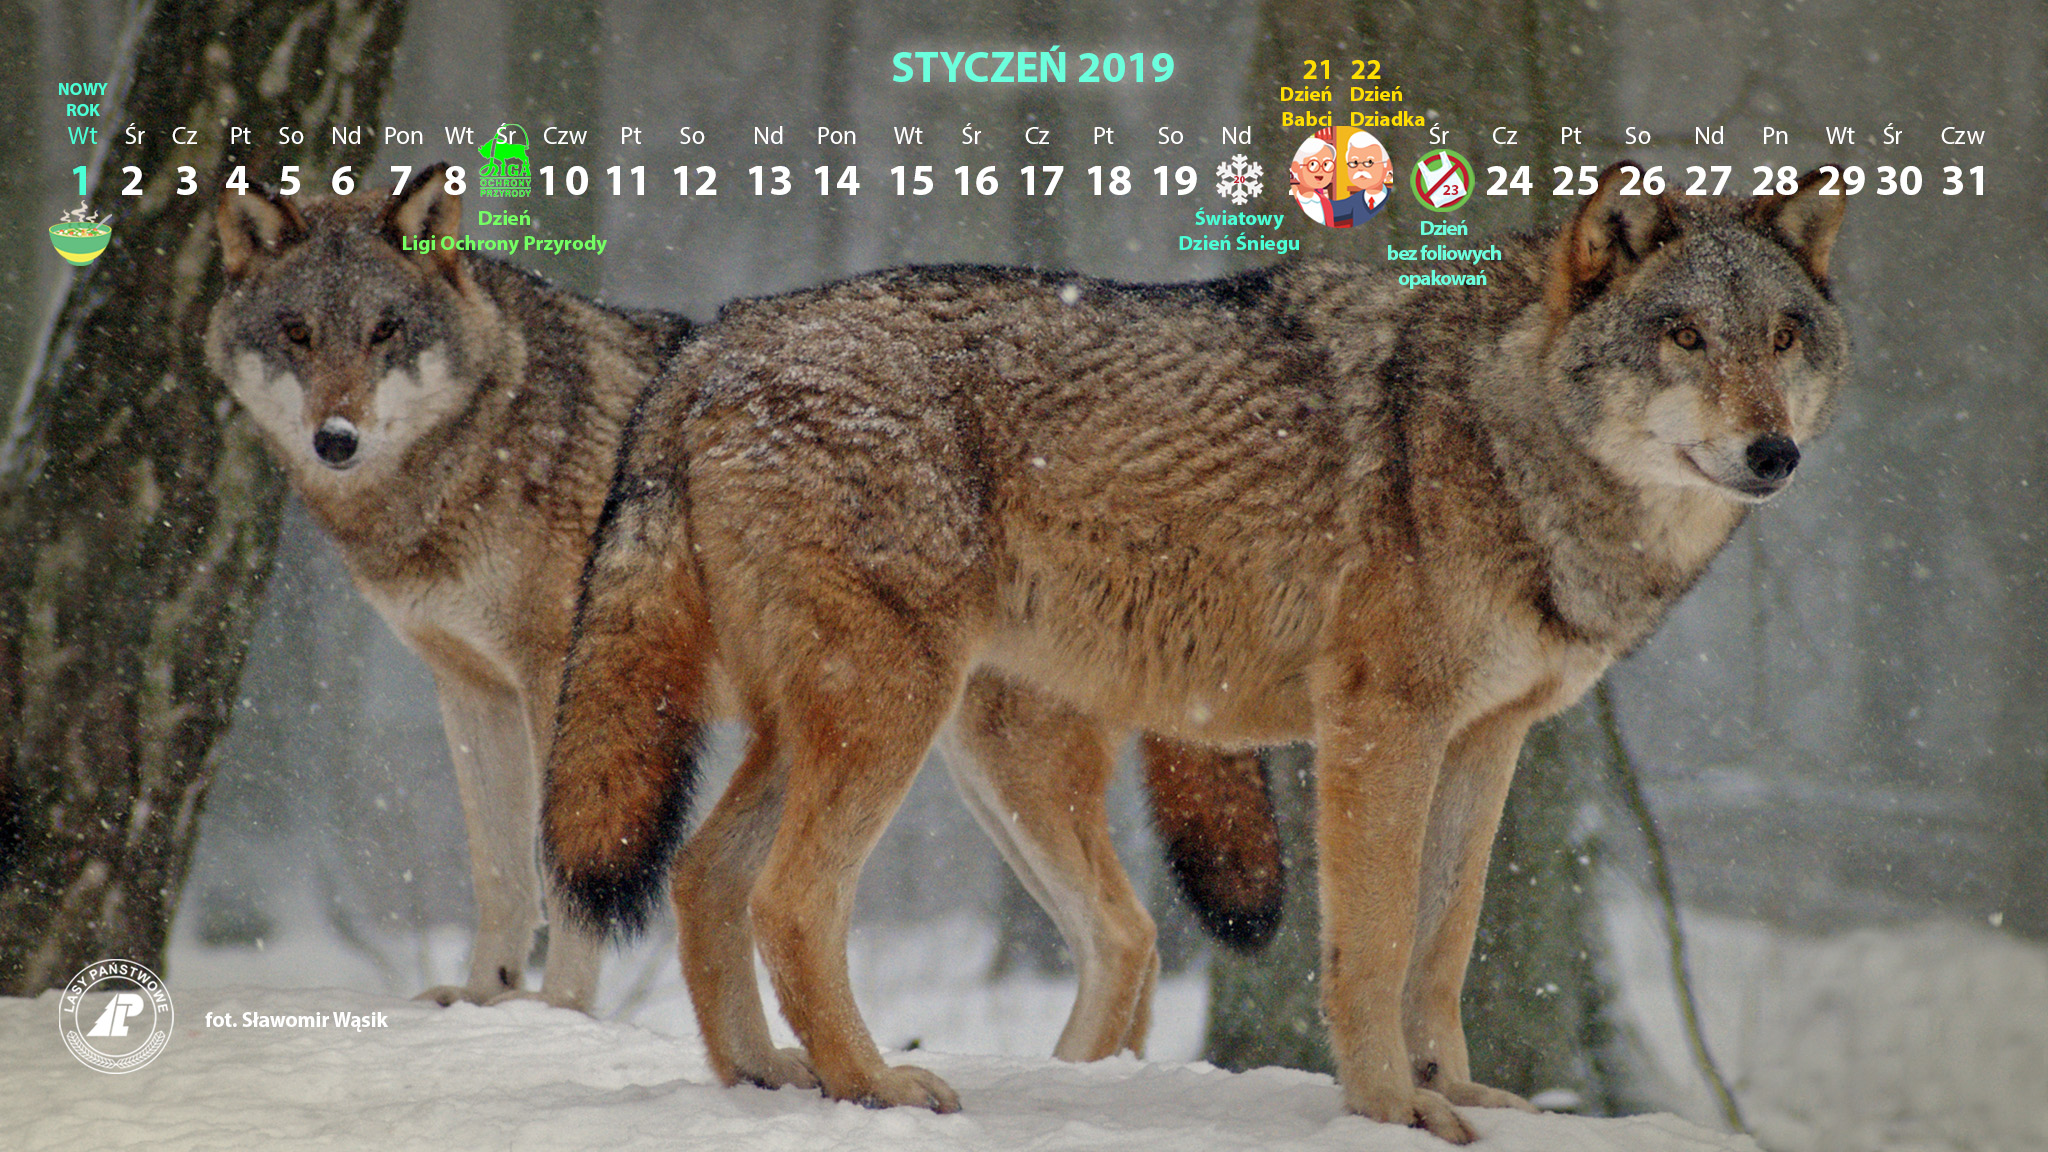 Kalendarz_styczeń_2019_2048x1152[1].jpg